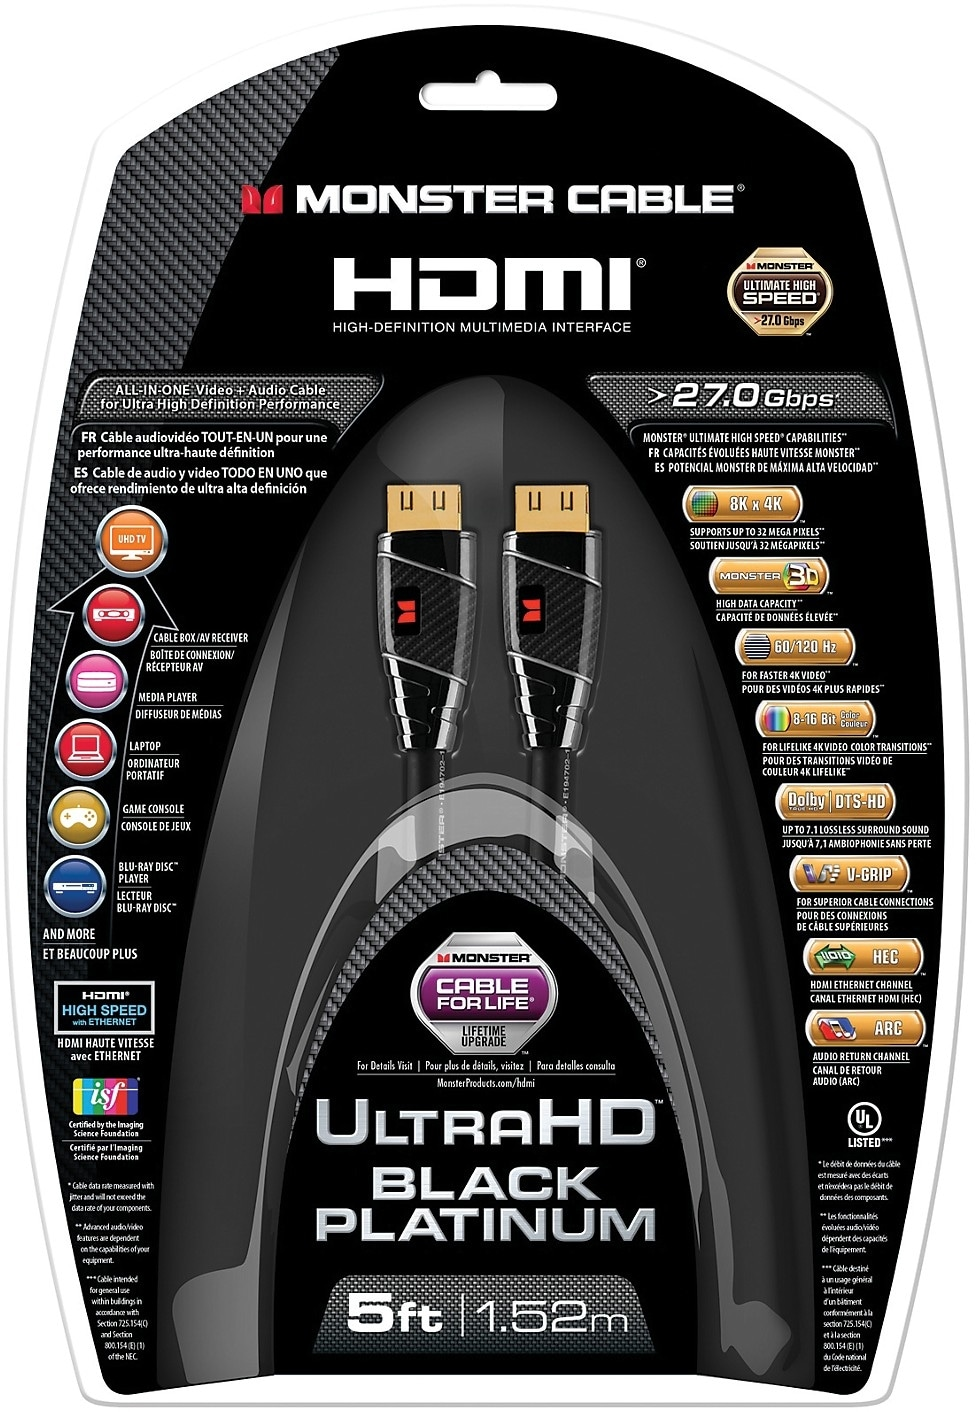 Monster 174 Ultra Hd Black Platinum Ultimate High Speed Hdmi